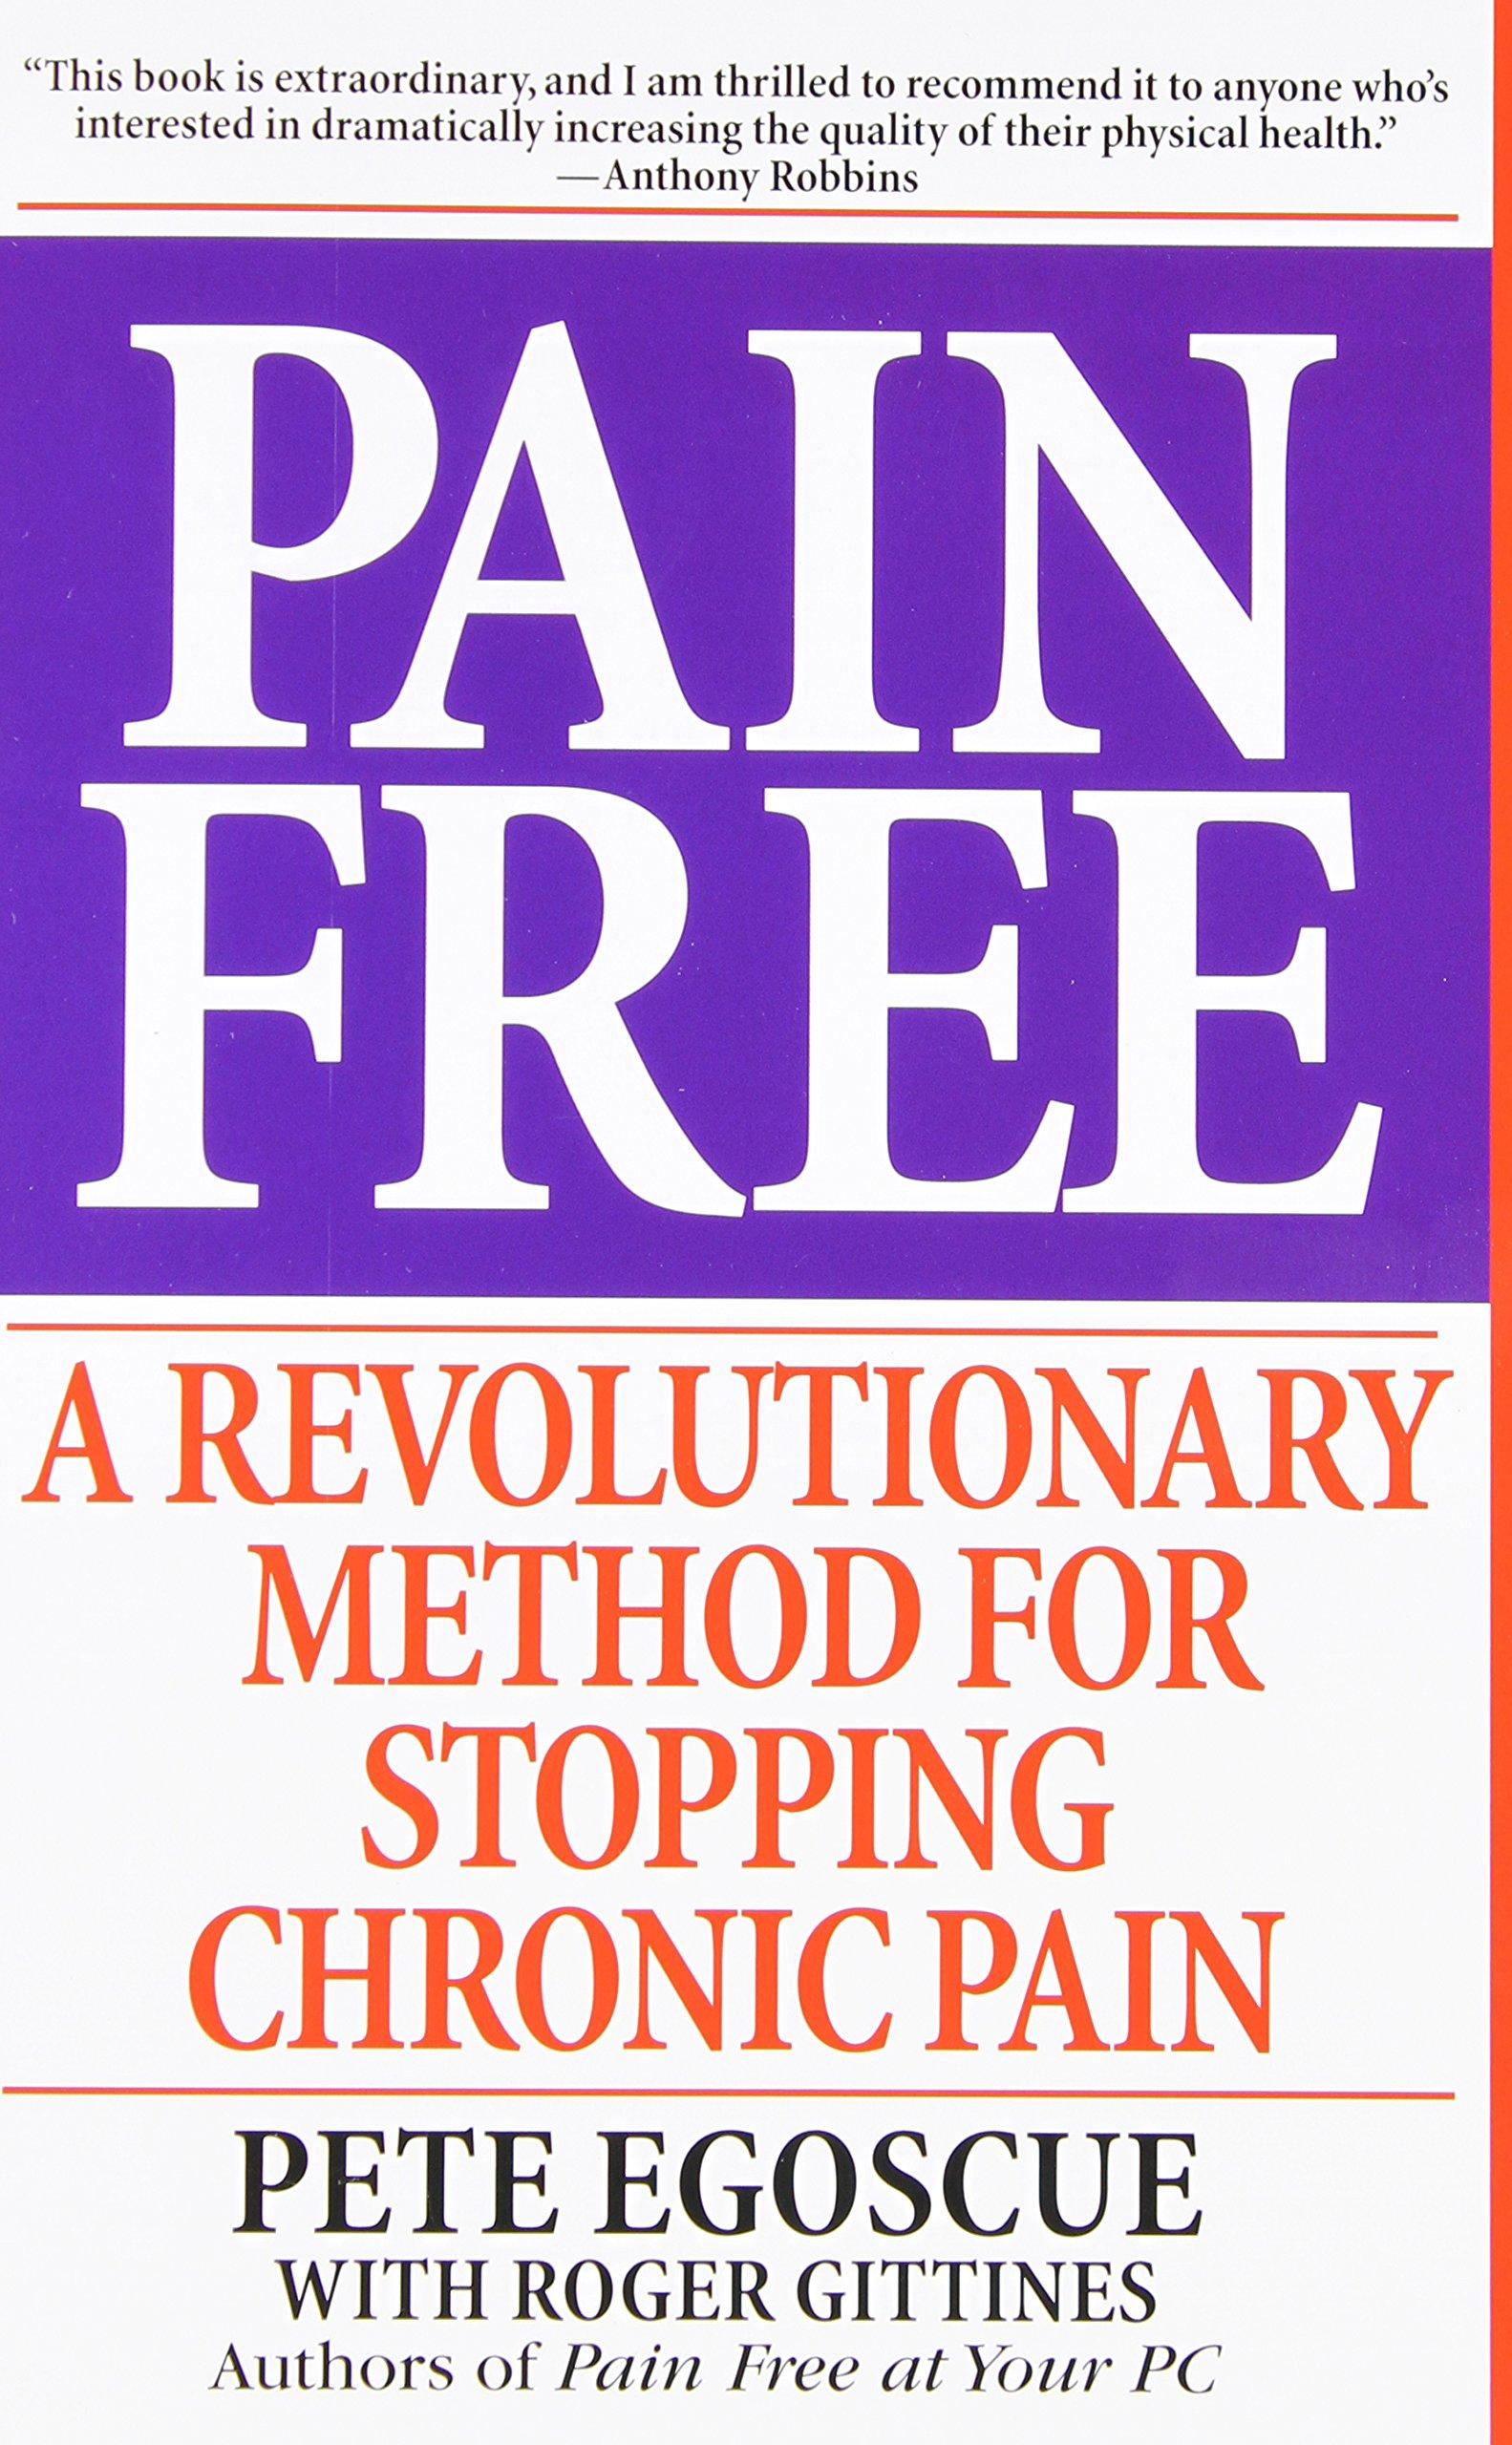 pain a revolutionary method for stopping chronic pain pete pain a revolutionary method for stopping chronic pain pete egoscue roger gittines 8580001041247 com books